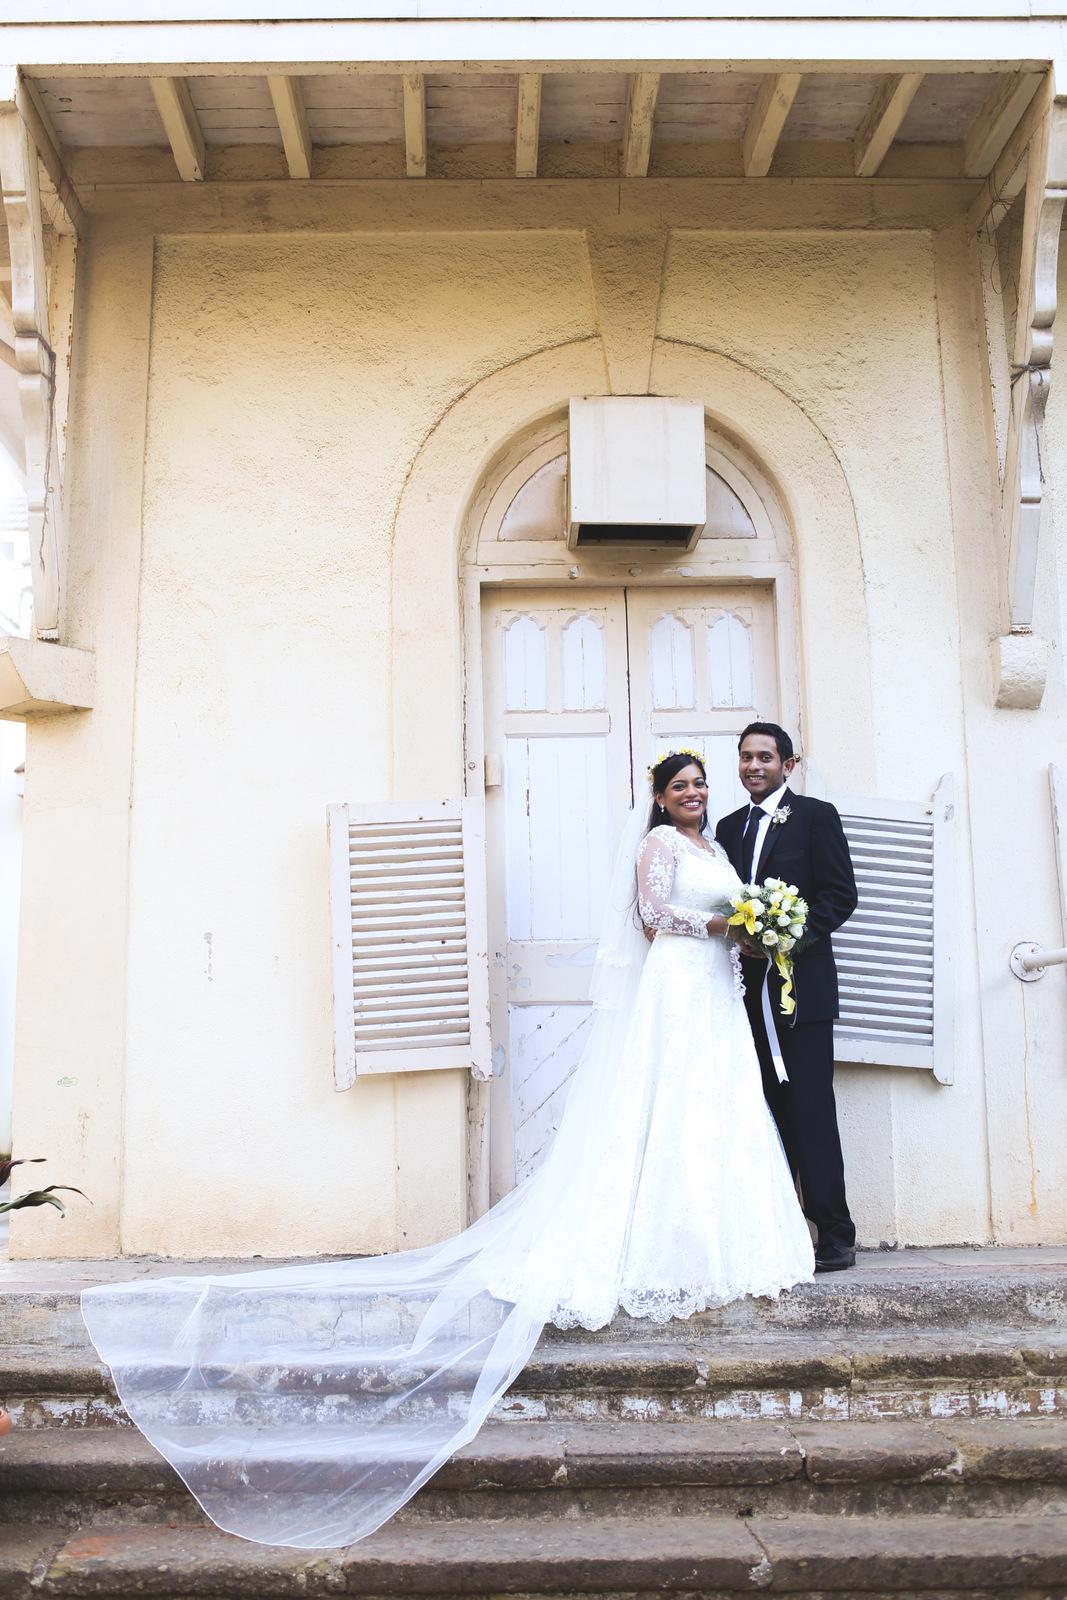 mumbai-wedding-into-candid-photography-rt-22.jpg